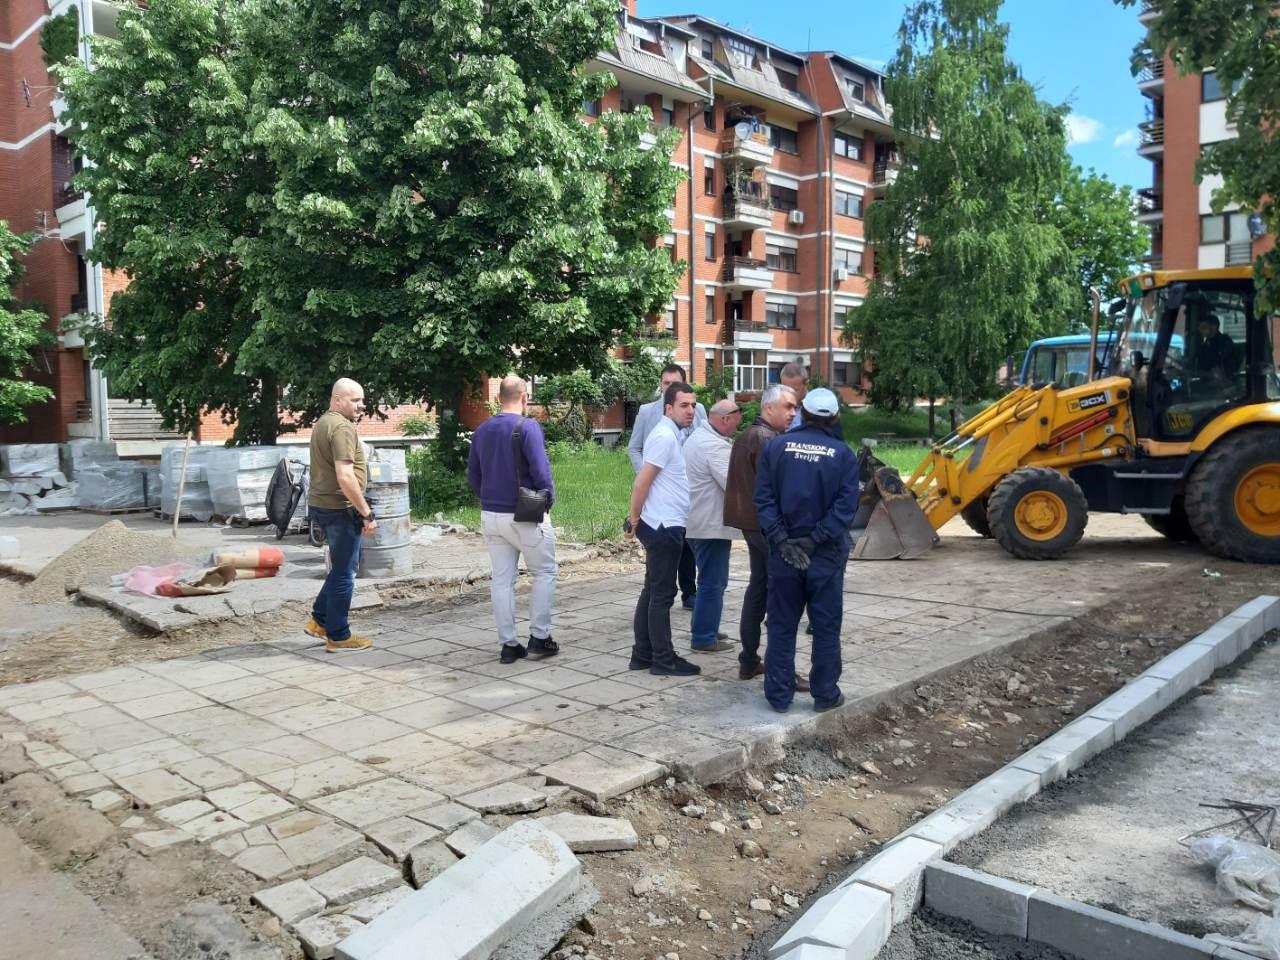 Obilazak radova, naselje Devete brigade, foto: A.S.